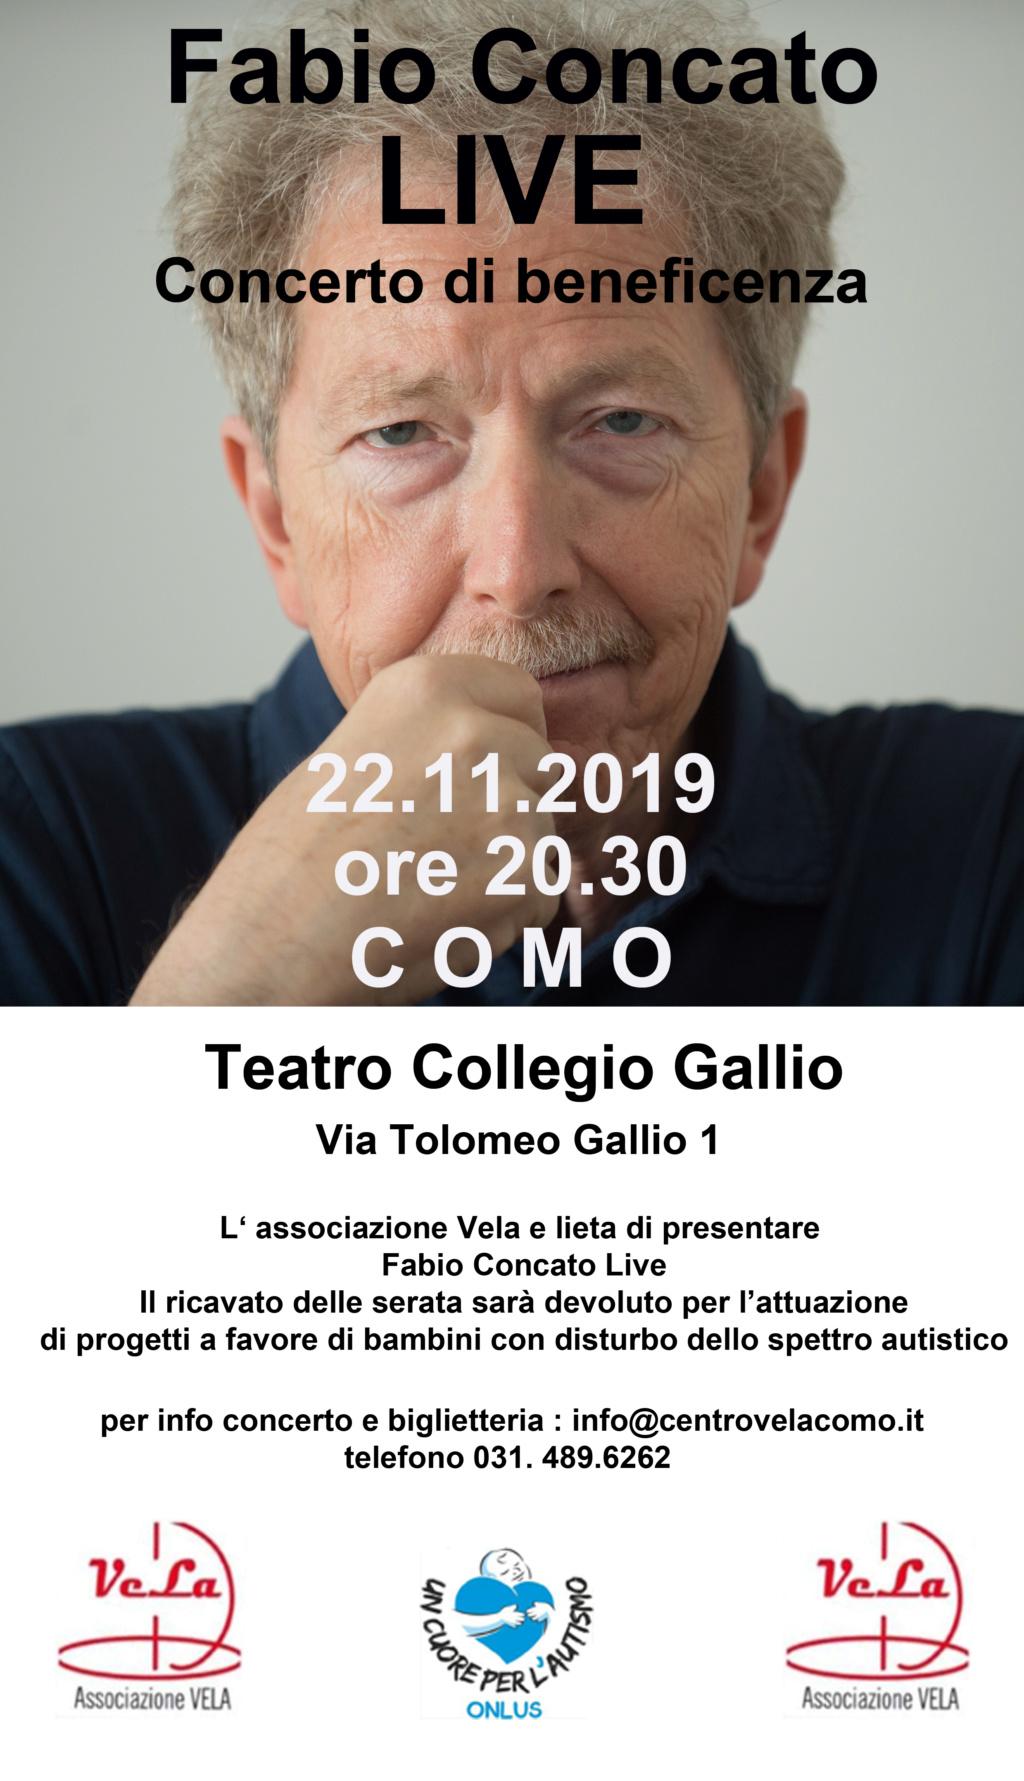 fabio concato - gigi Fabio_10